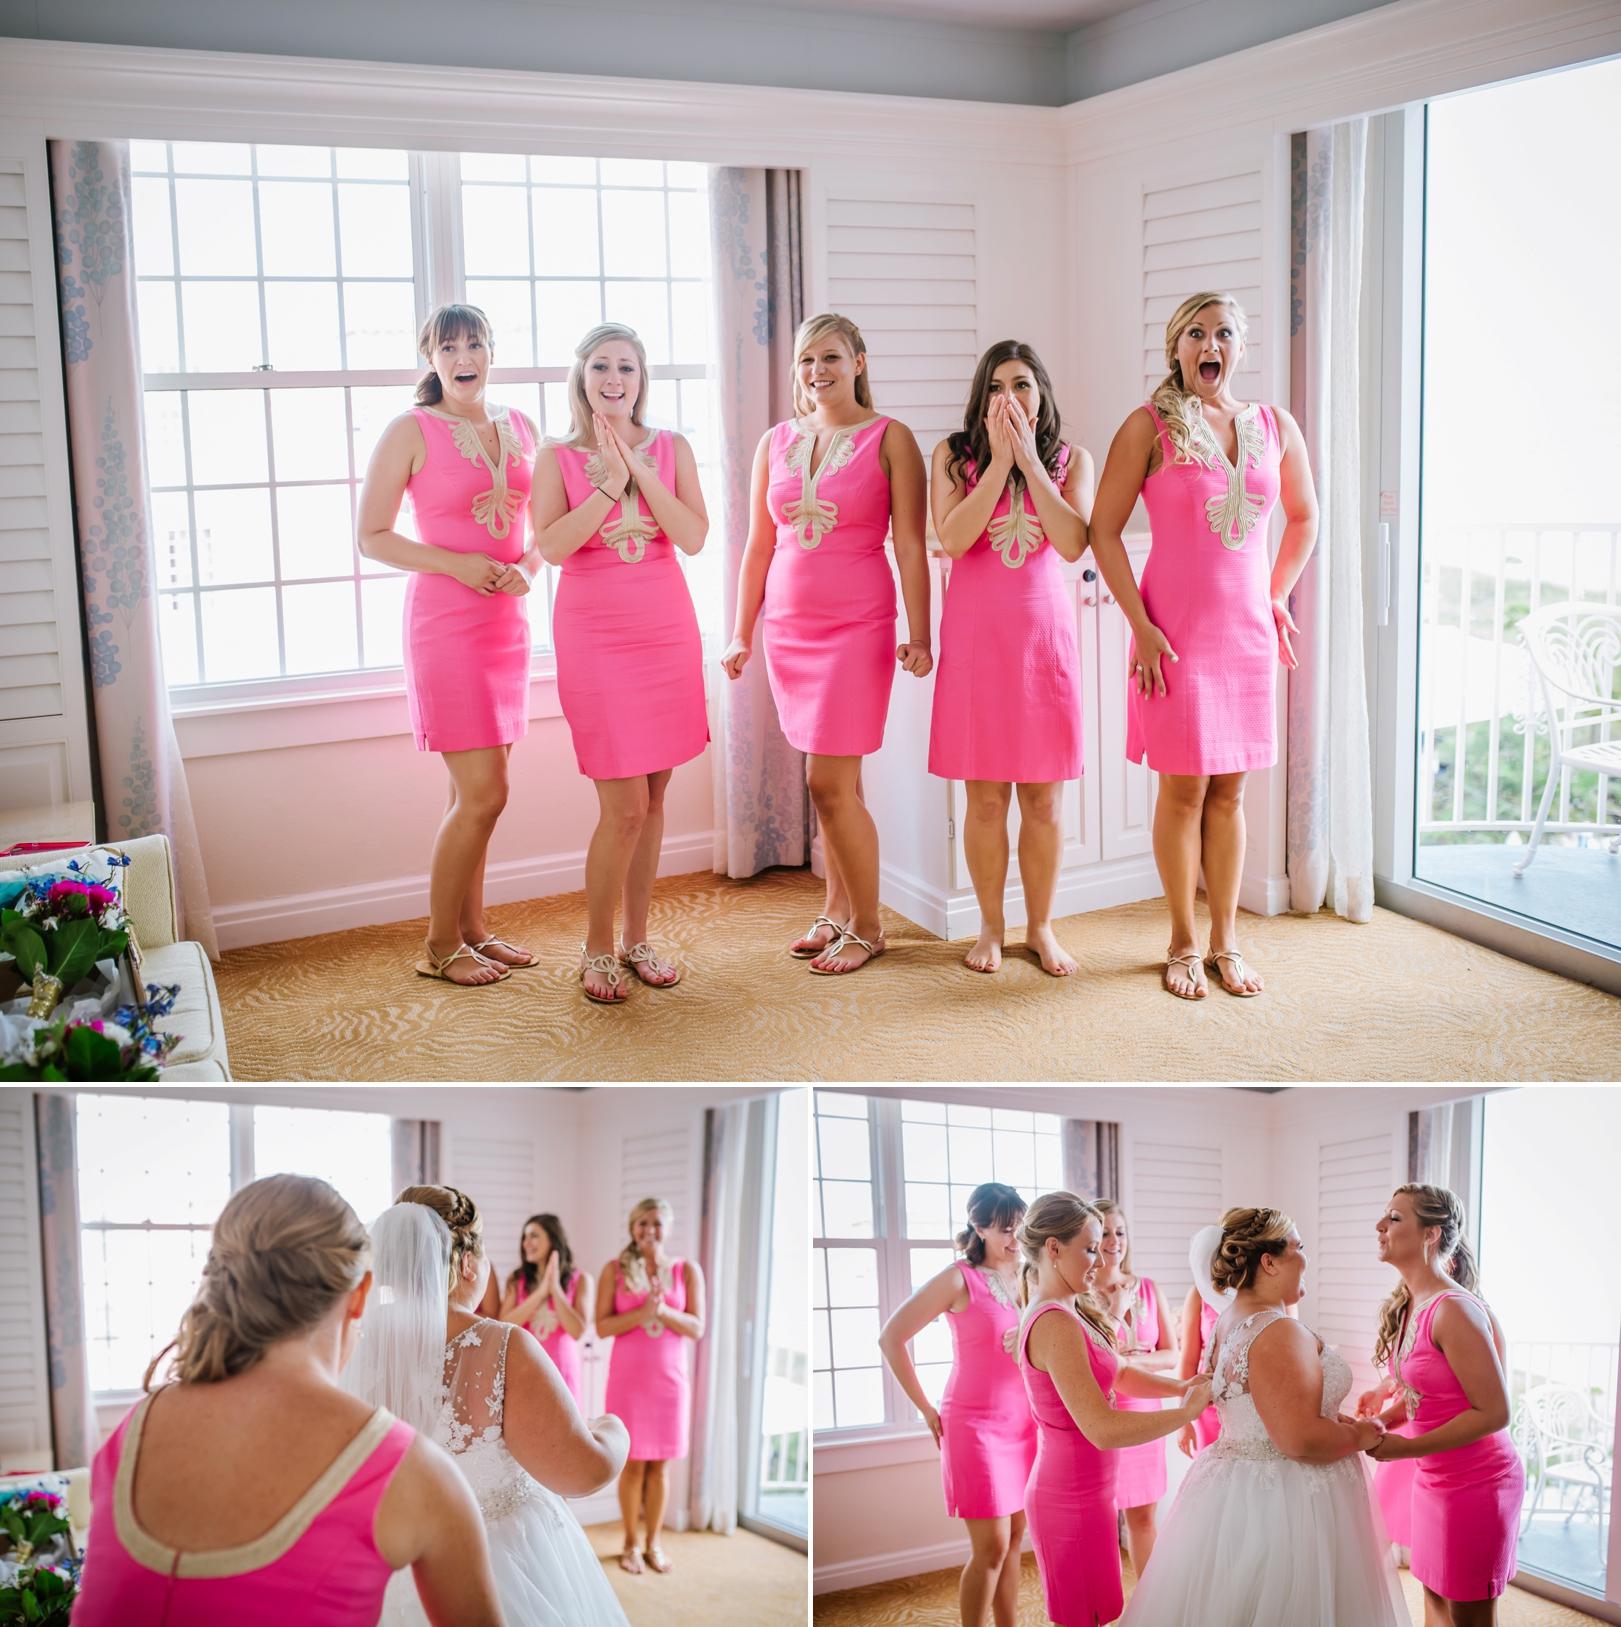 St-pete-wedding-photographer-don-caesar-ashlee-hamon_0007.jpg